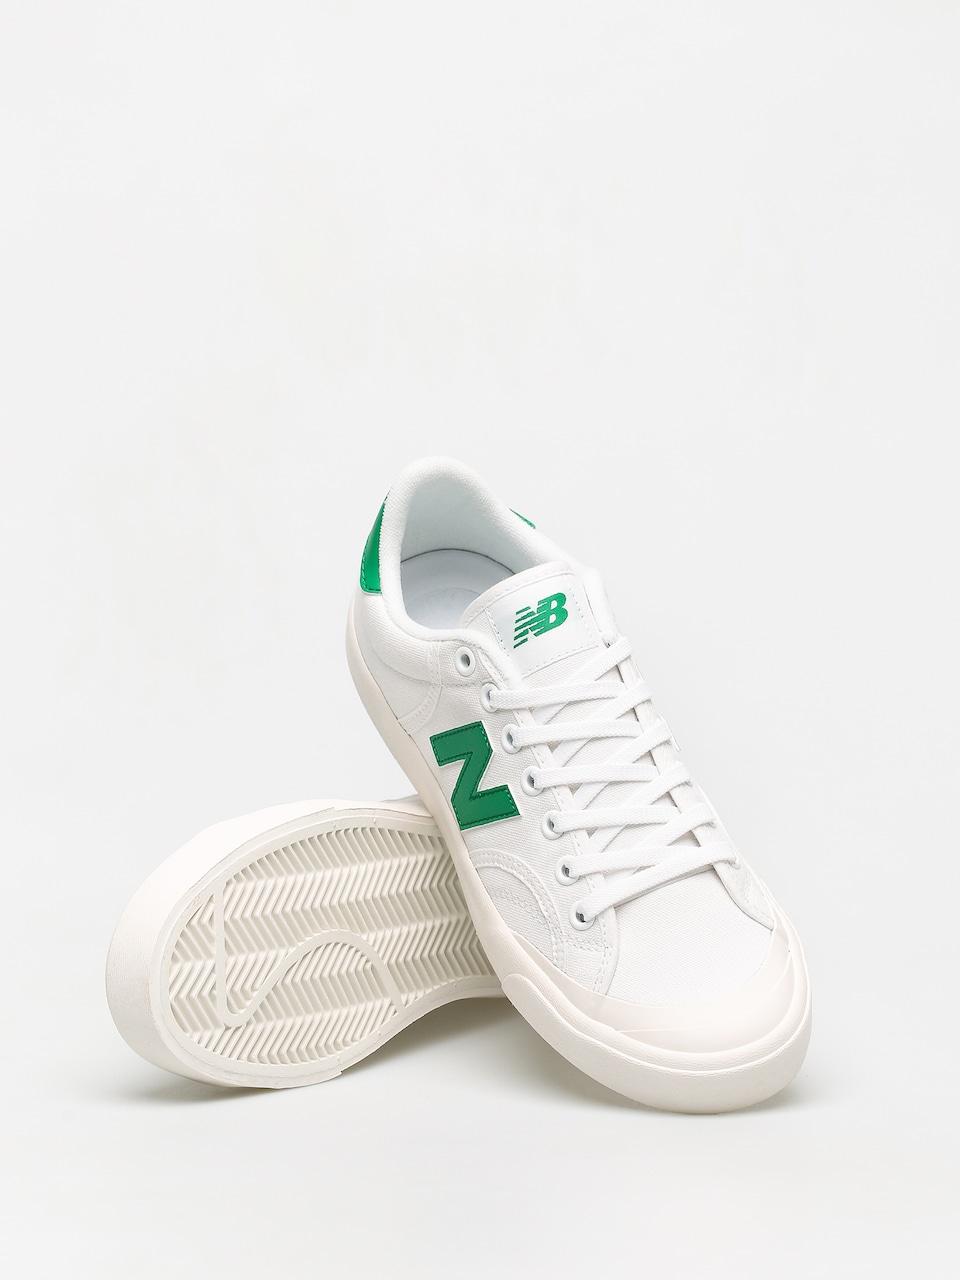 New Balance PROCT Shoes (white/green)